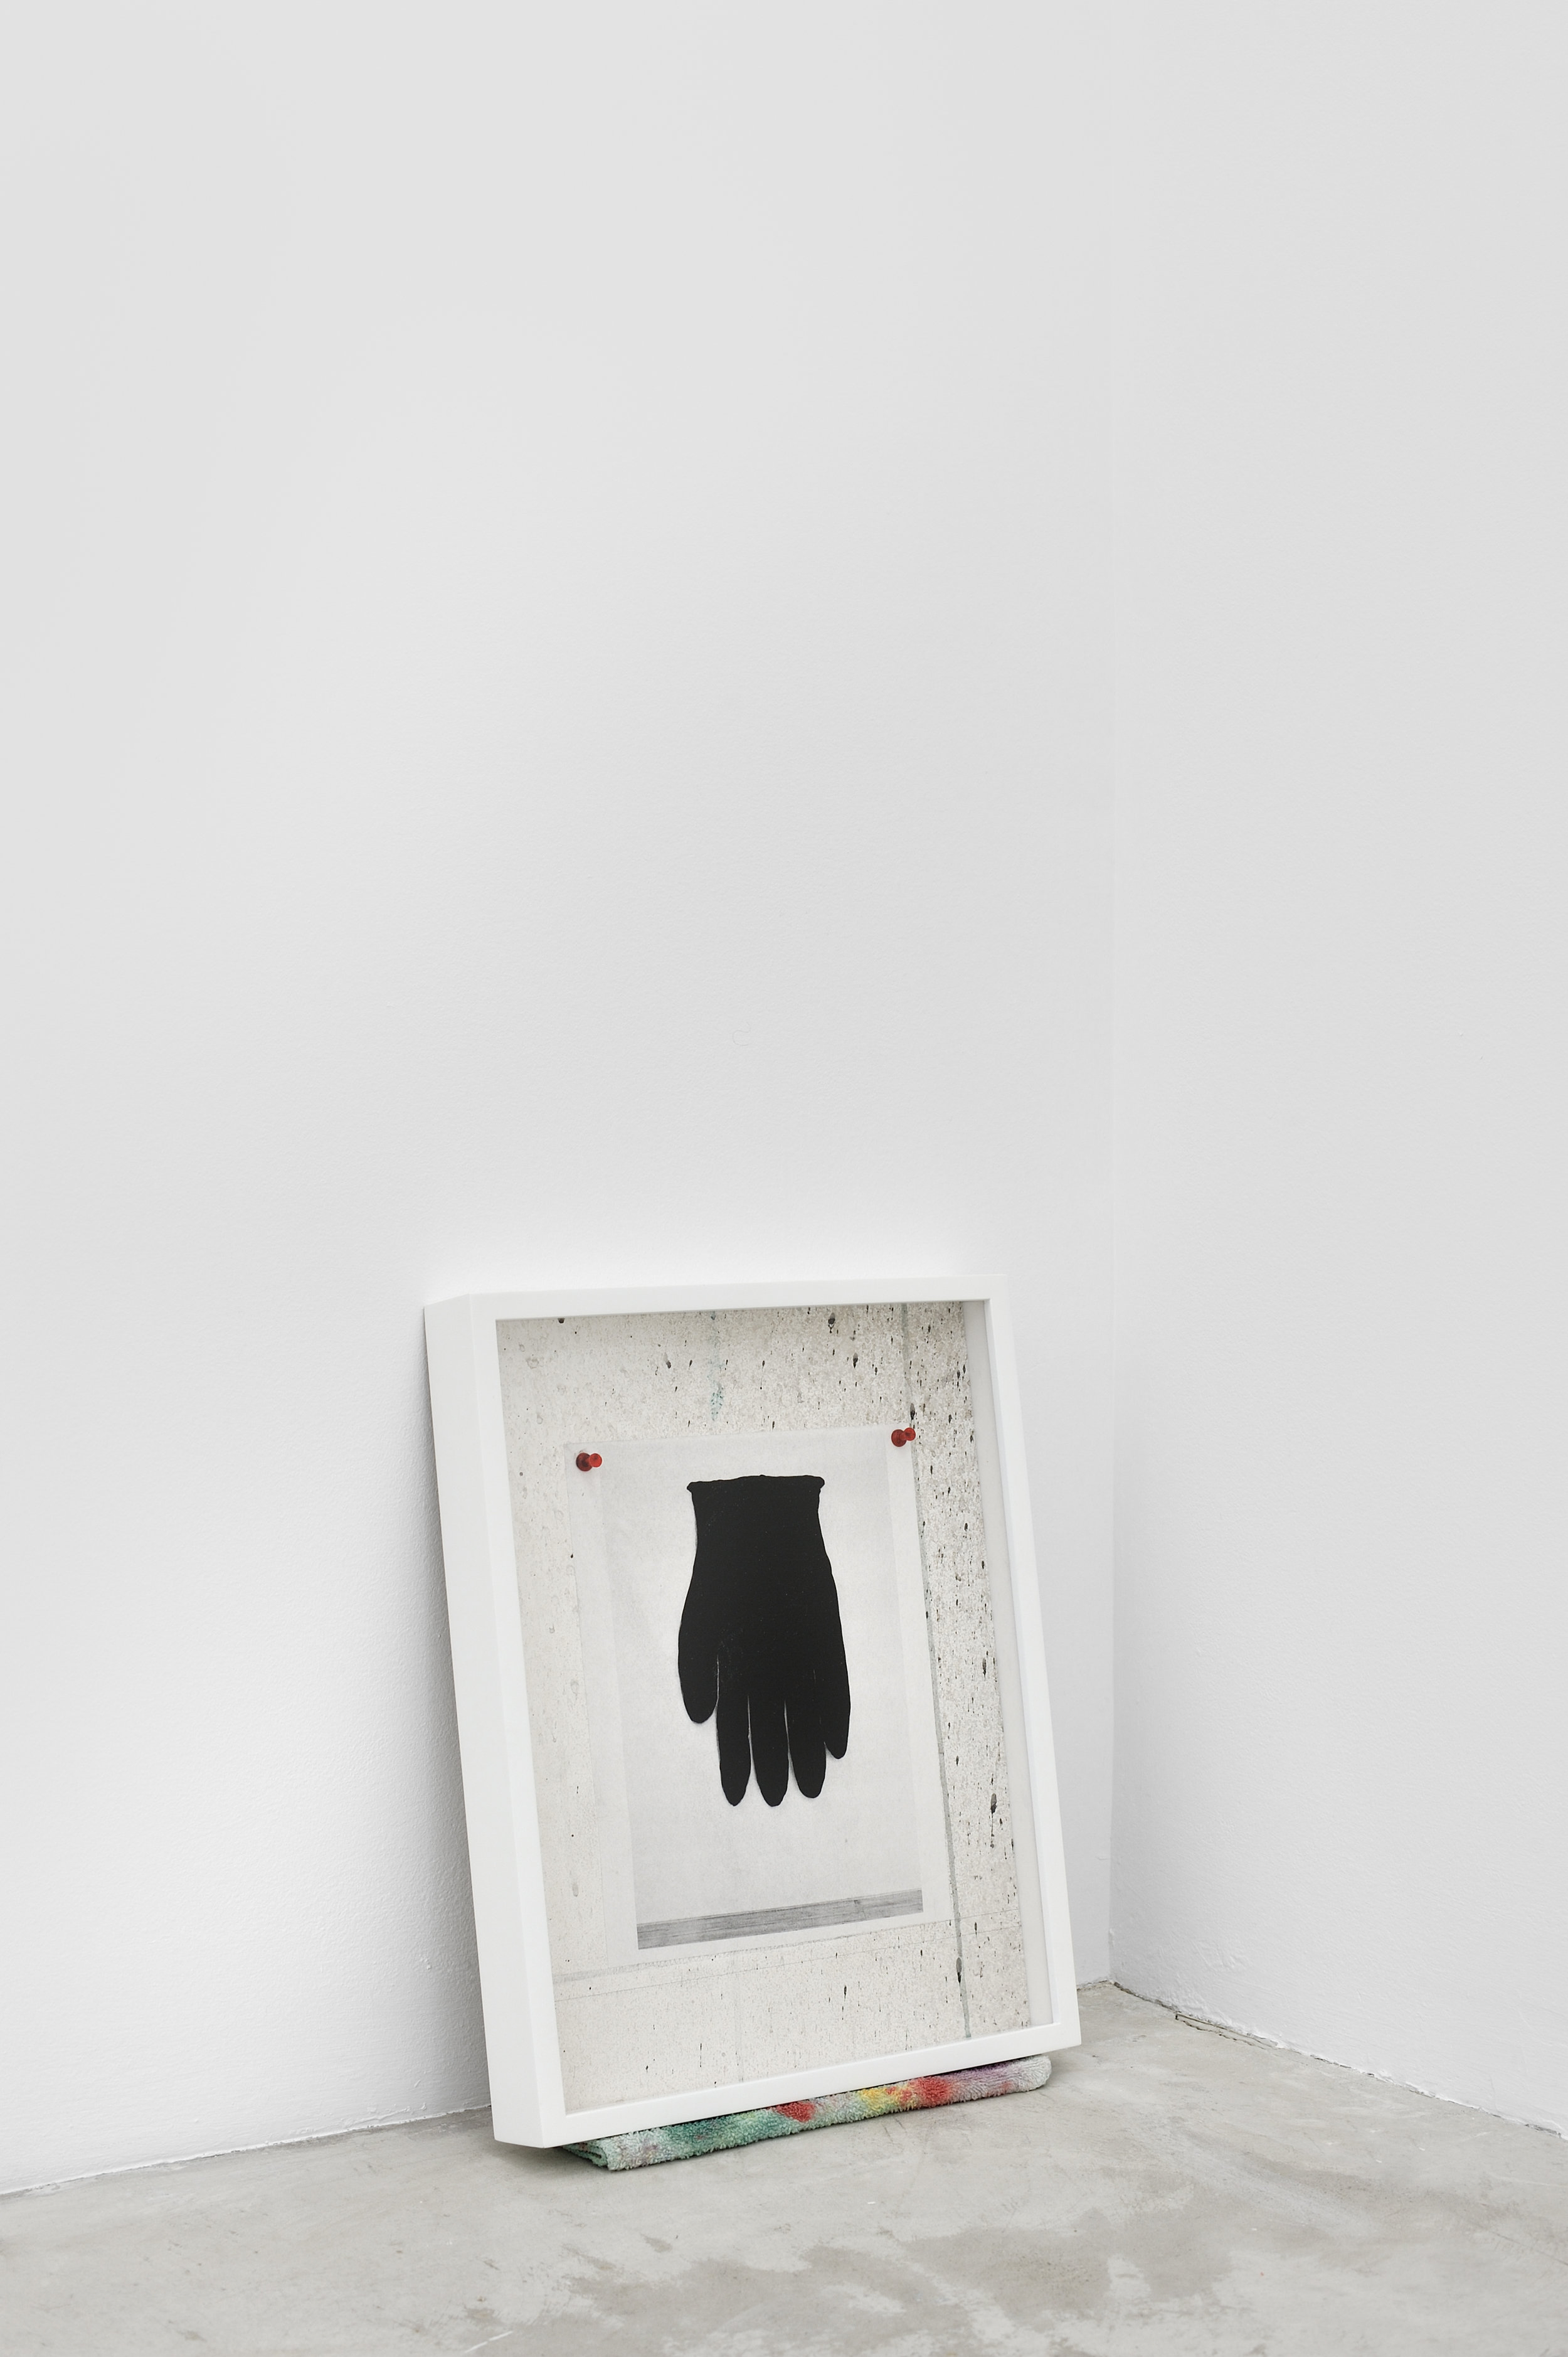 Untitled Still Life (BLACK GLOVE), 2015 sheetrock, latex paint, acrylic, graphite, acrylic on laser print, plastic thumbtacks 43,5 x 34 cm - 17 1/8 x 13 3/8 inches (framed)